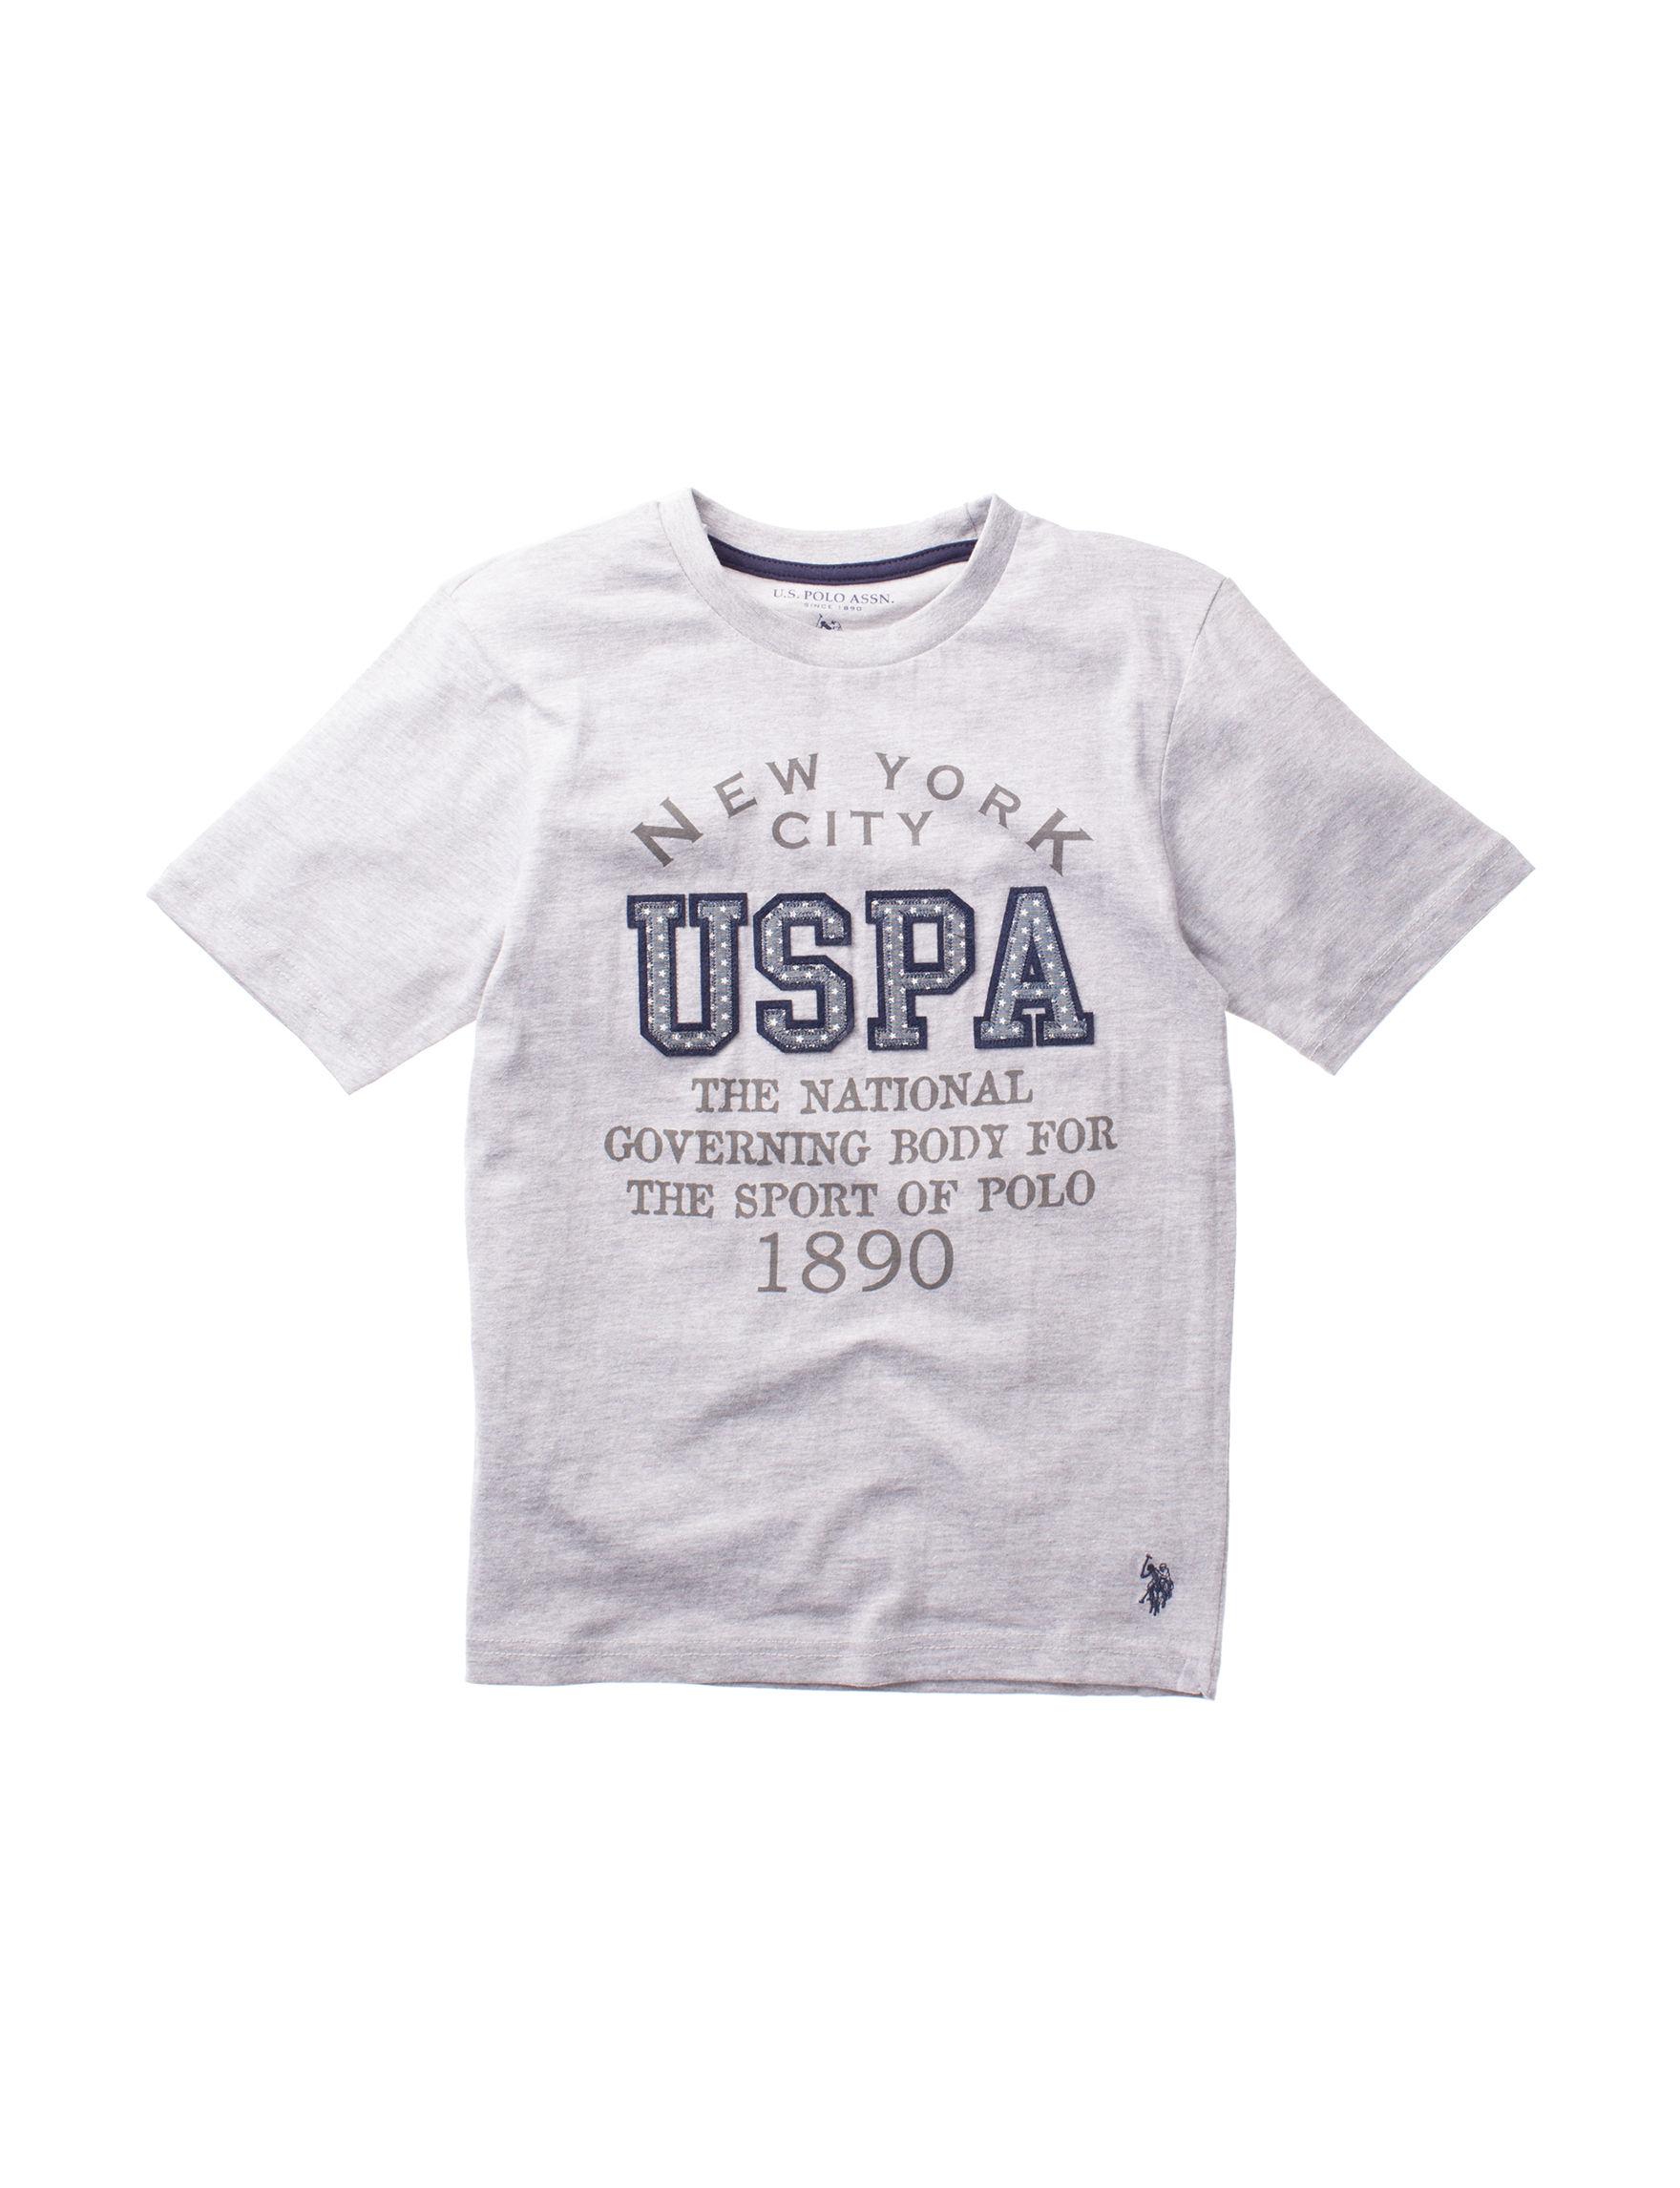 U.S. Polo Assn. Heather Grey Tees & Tanks